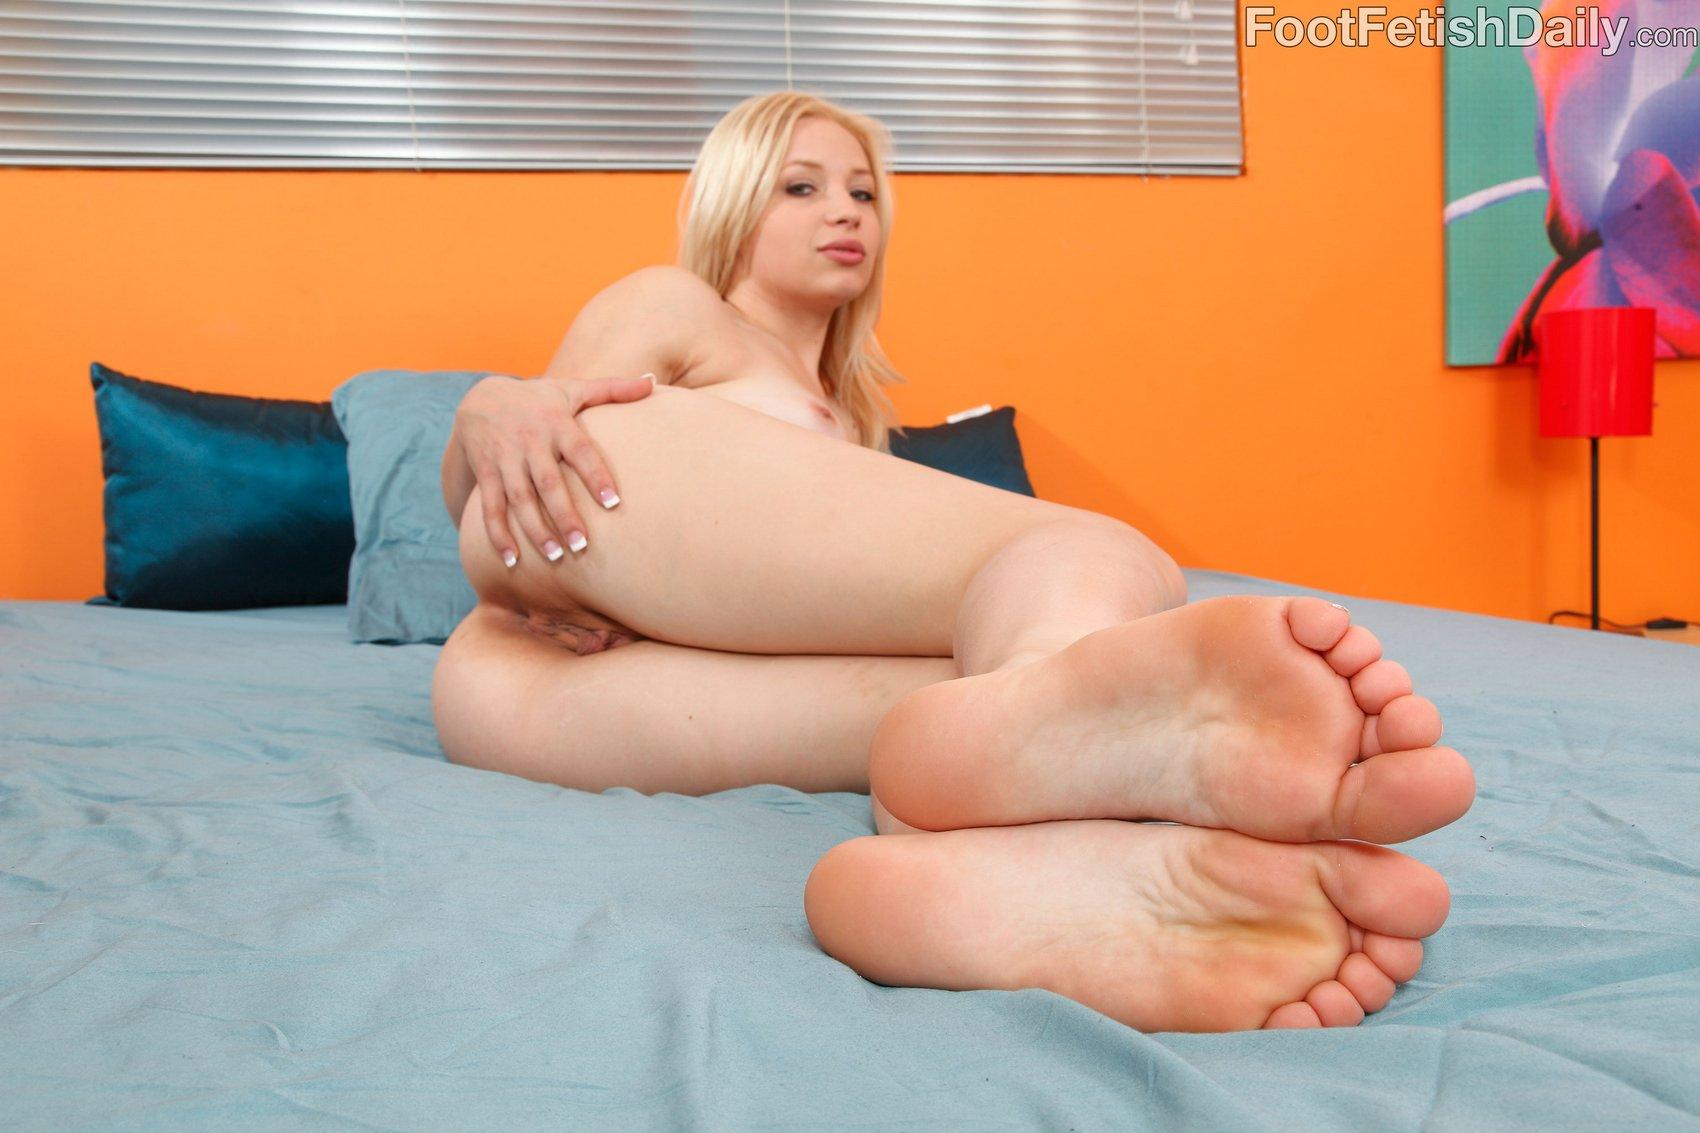 Nude young petite girl chloroform